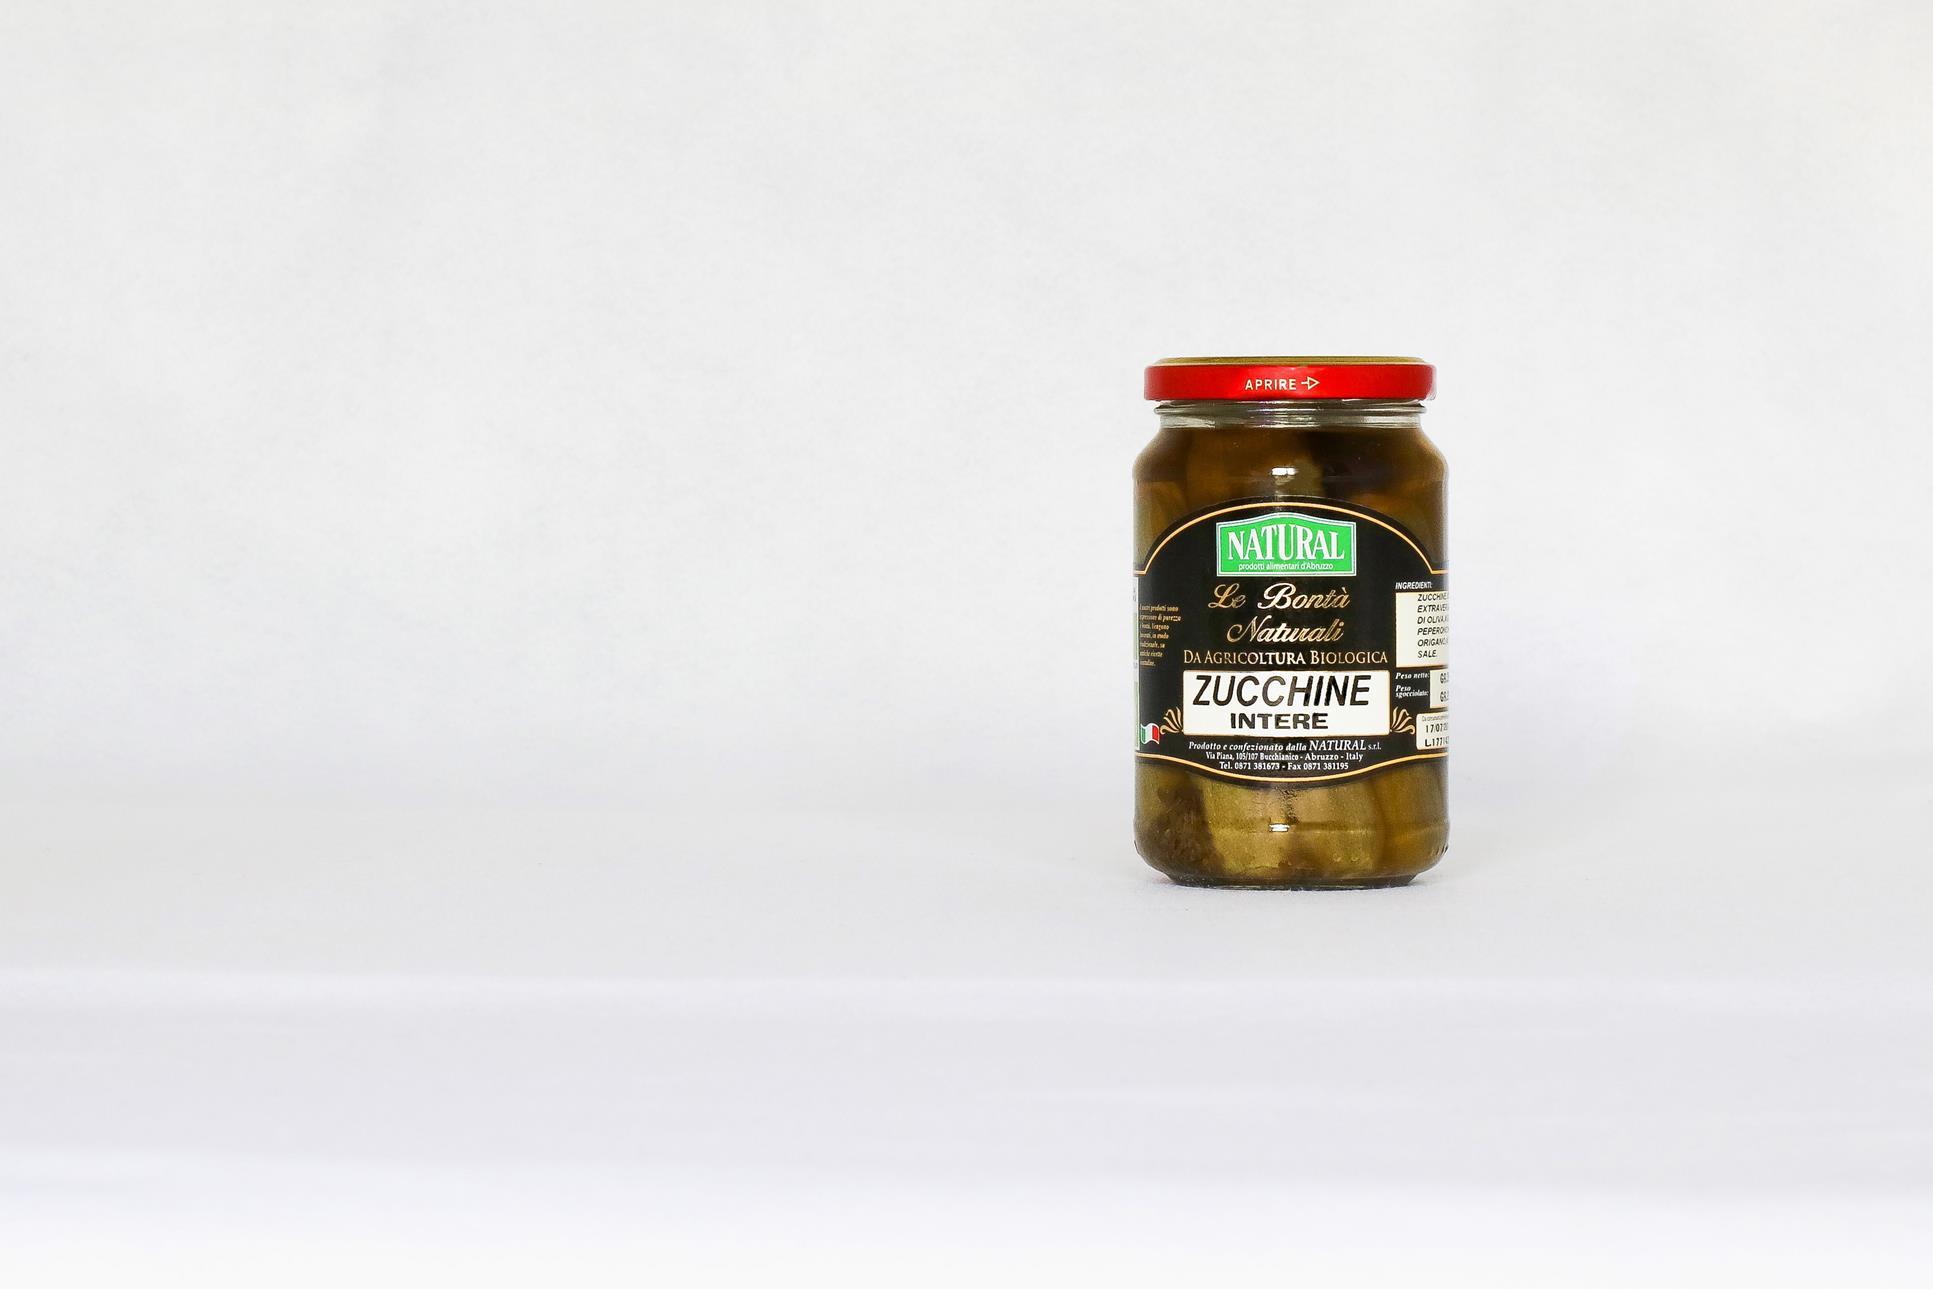 Natural Zucchine Intere Sottolio Biologiche